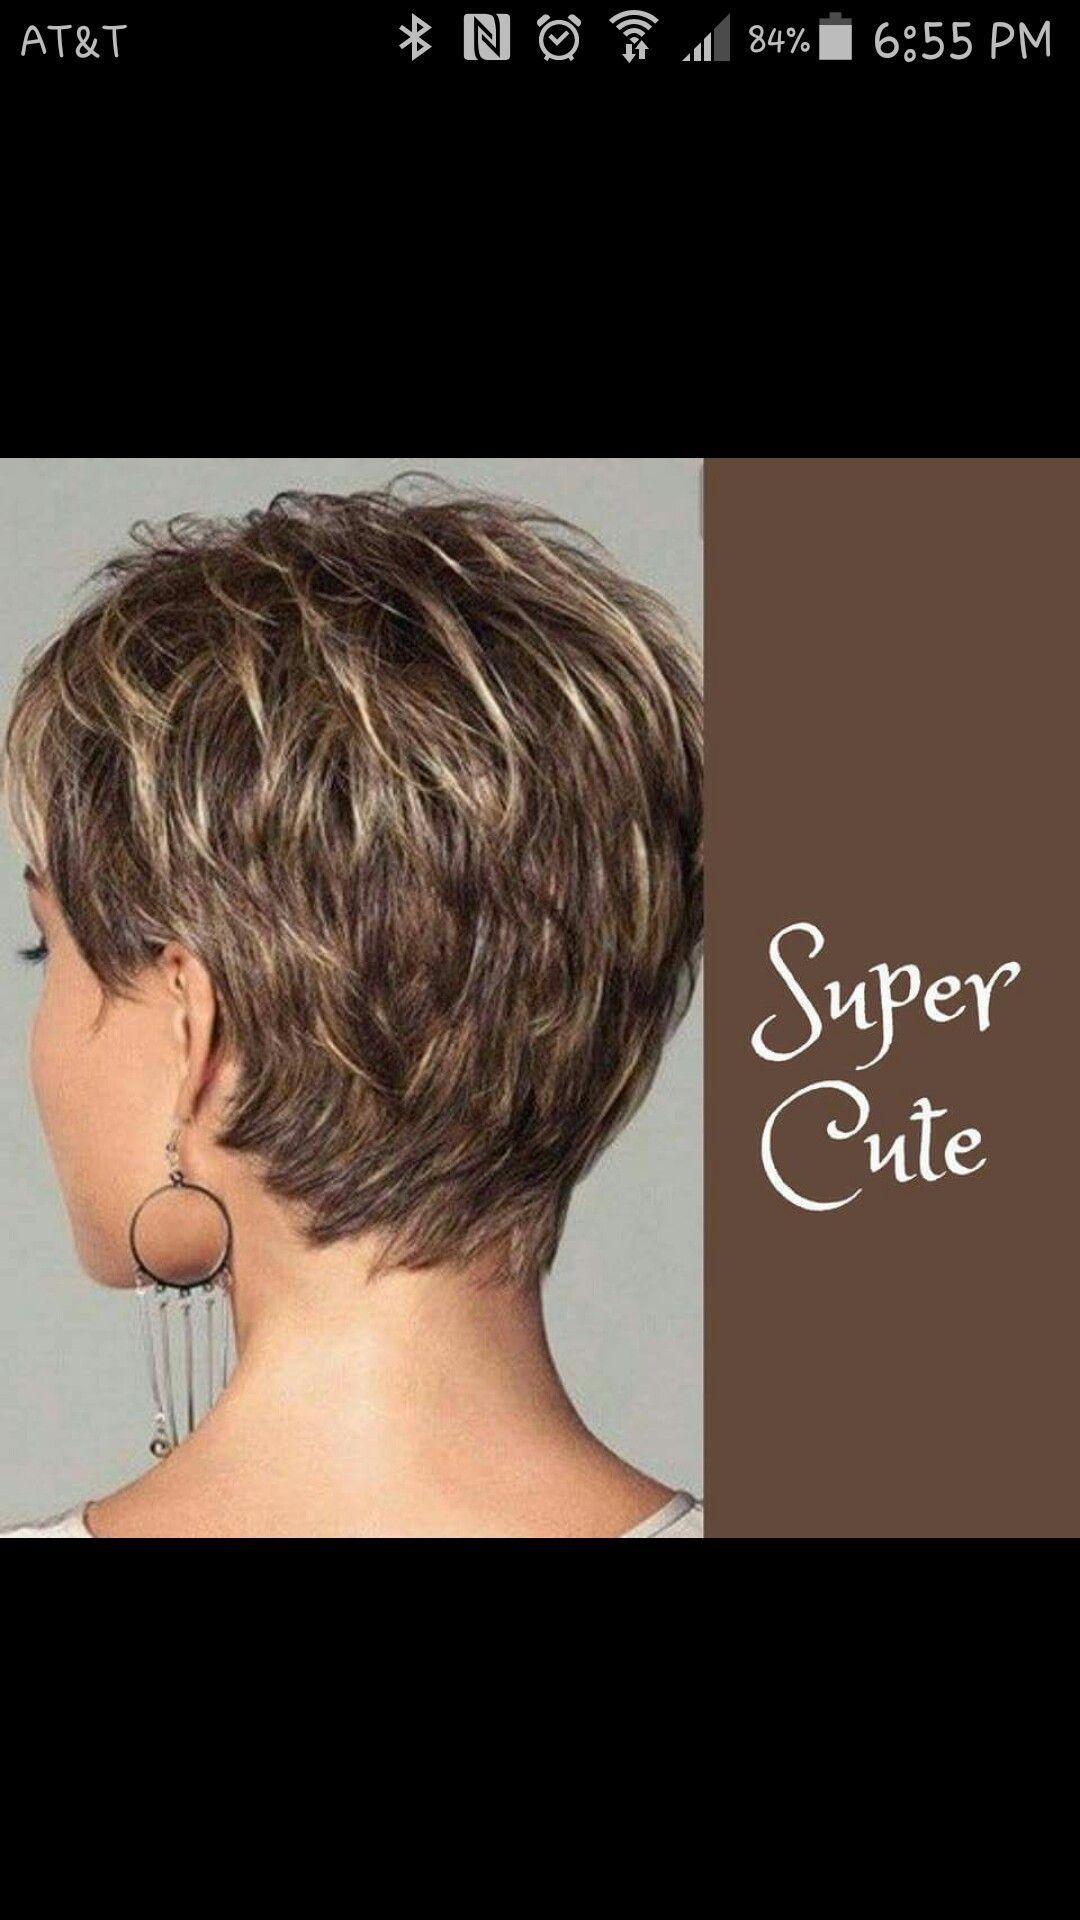 Pin by shelly feneide on hair pinterest hair style hair cuts